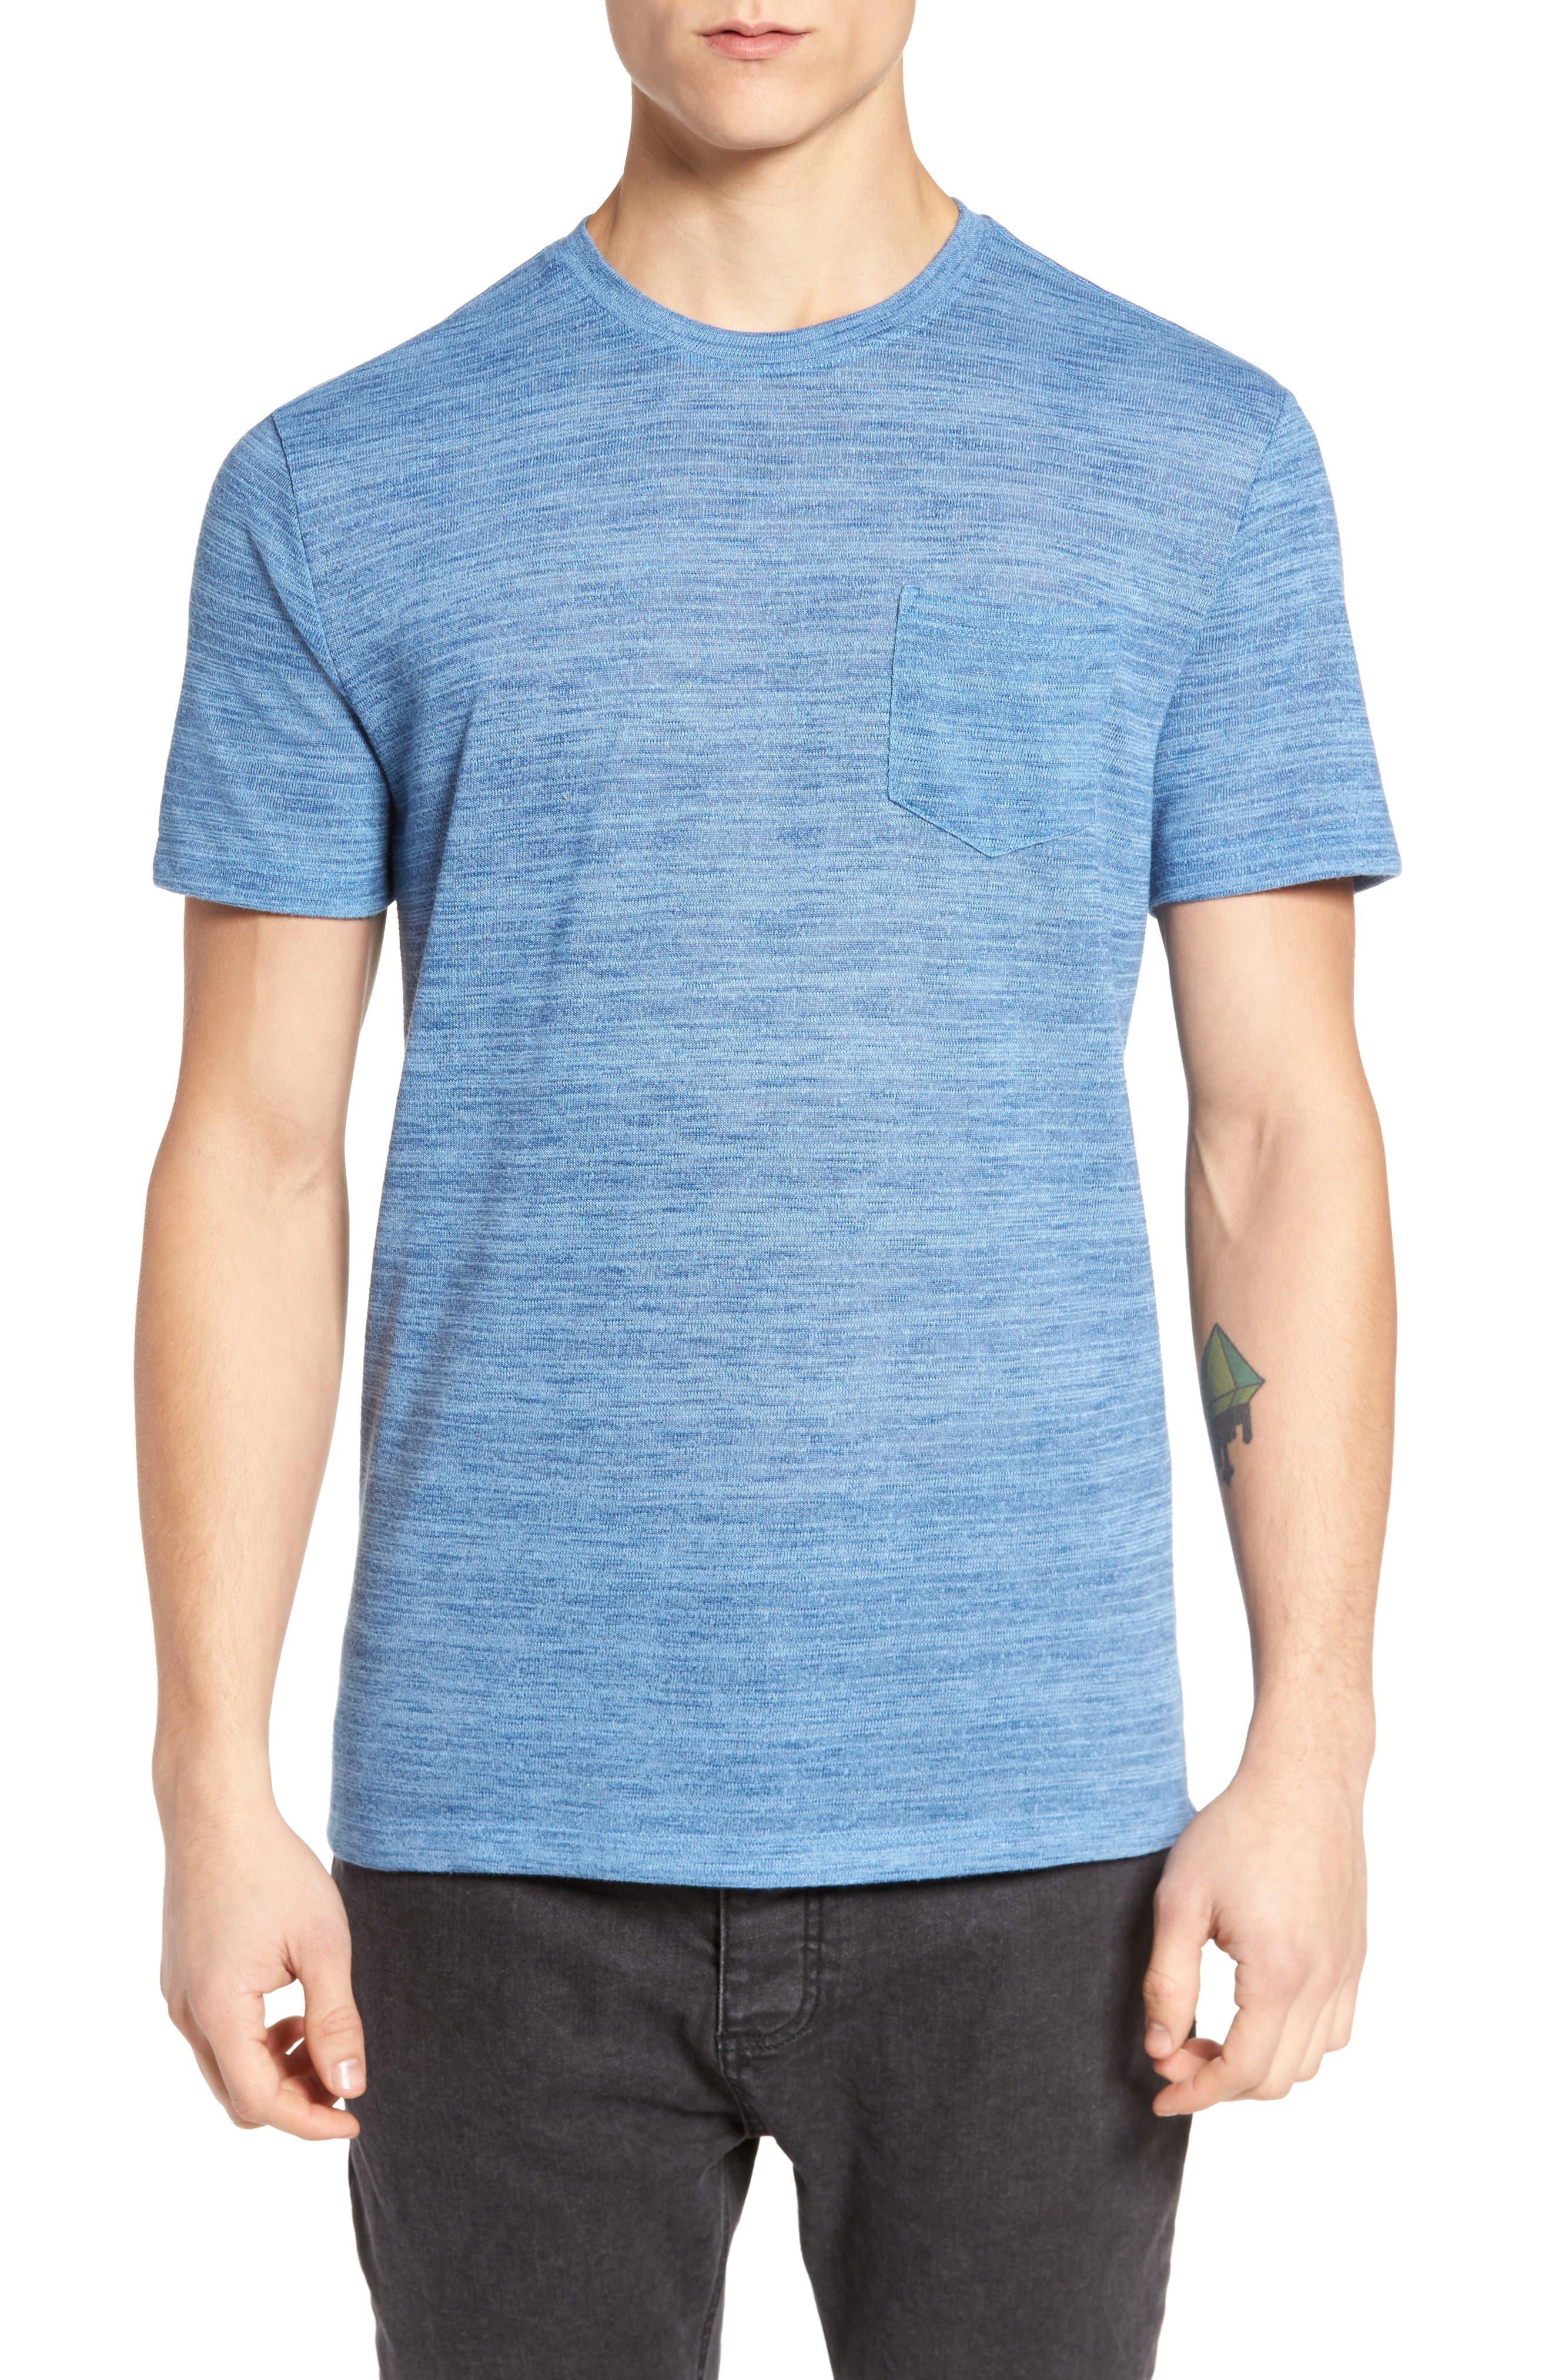 Alternate Image 1 Selected - The Rail Slubbed Pocket T-Shirt